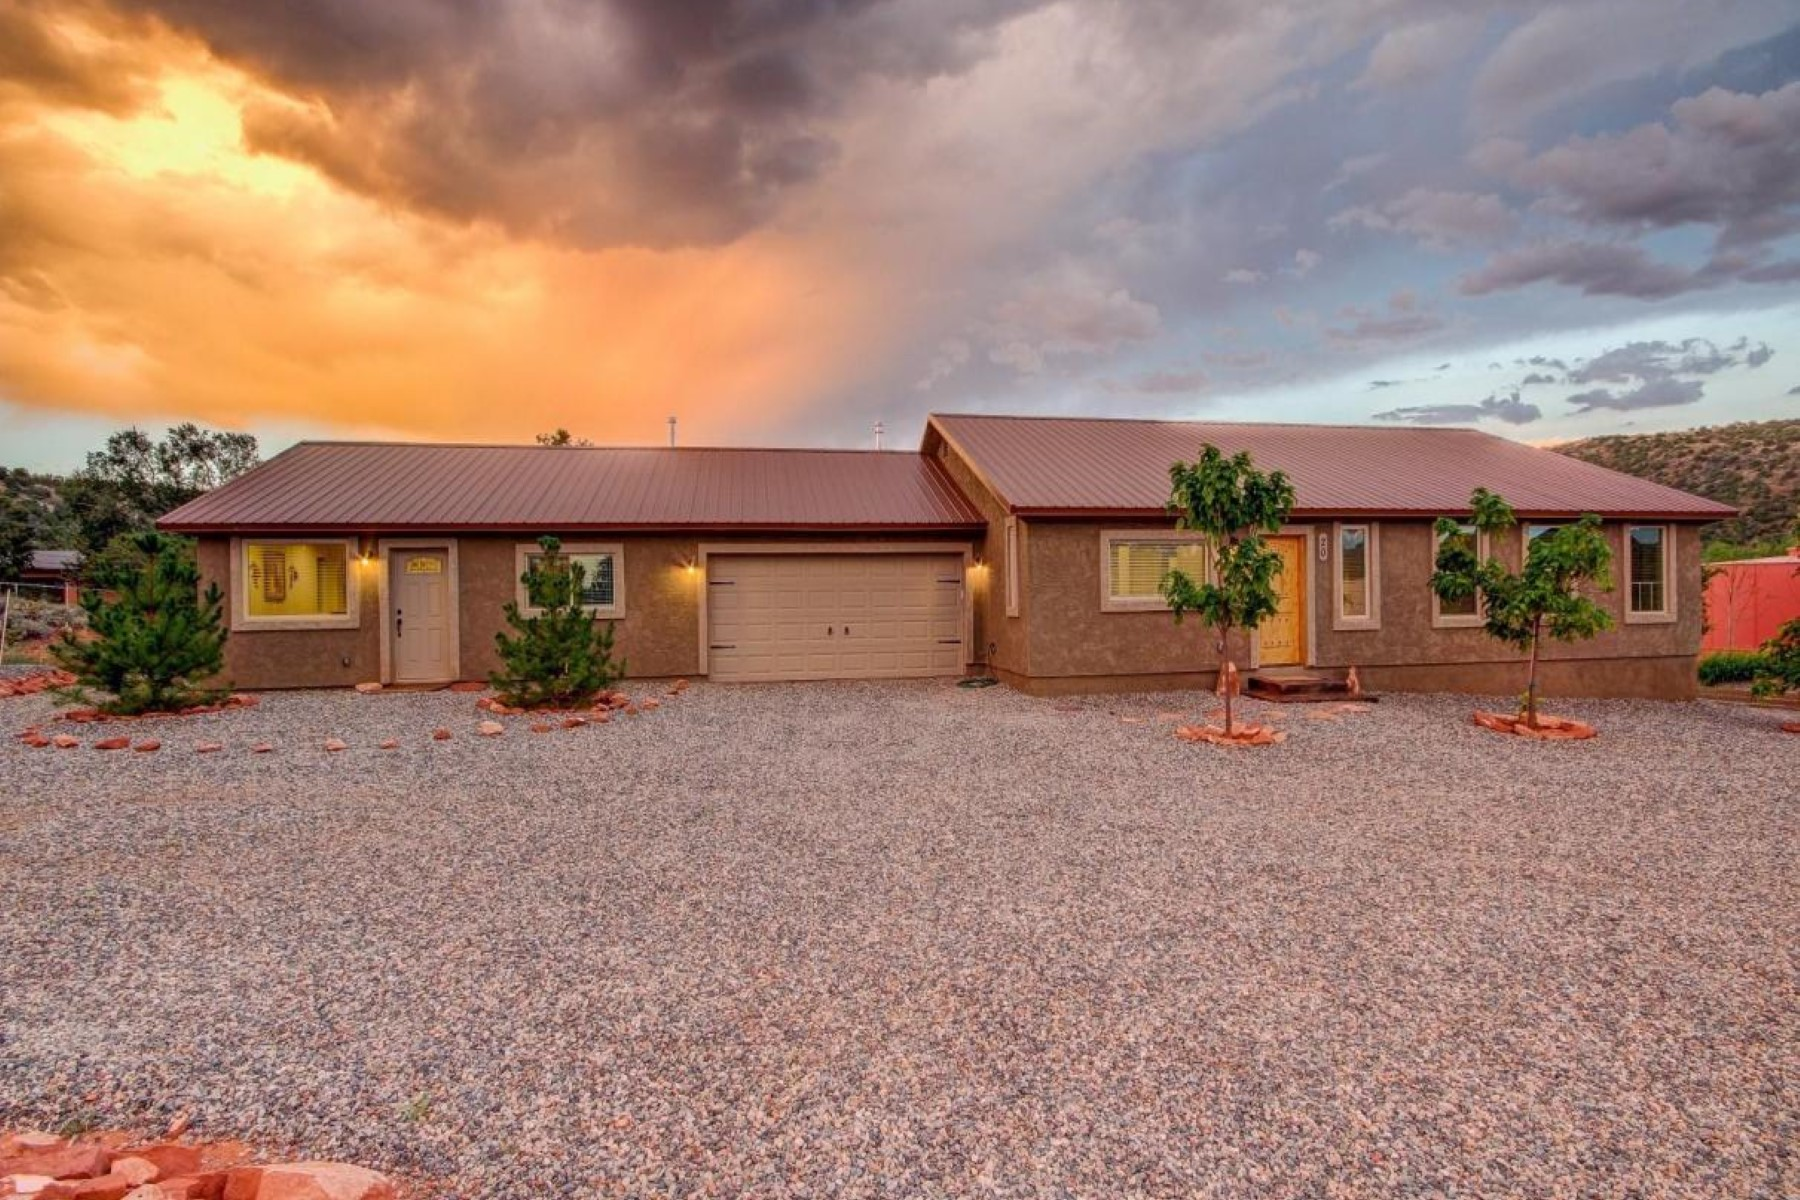 Single Family Home for Sale at Beautiful two bedroom home 20 Cascade Drive Sedona, Arizona 86336 United States